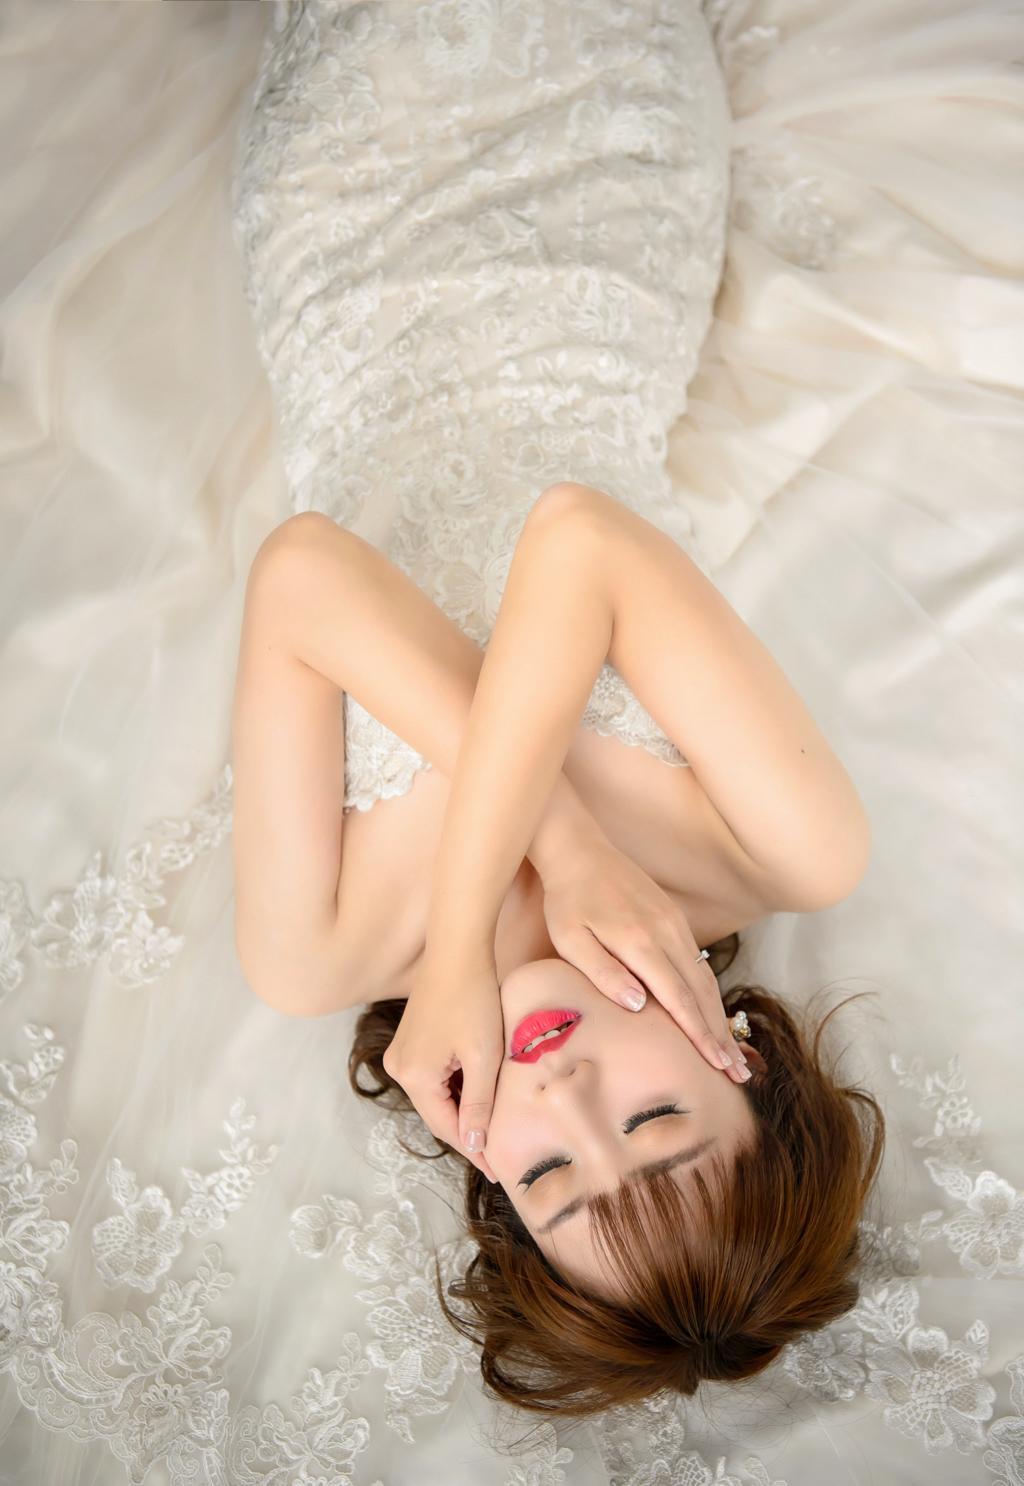 婚攝小勇, 小寶團隊, 自助婚紗, niniko, wedding day-011